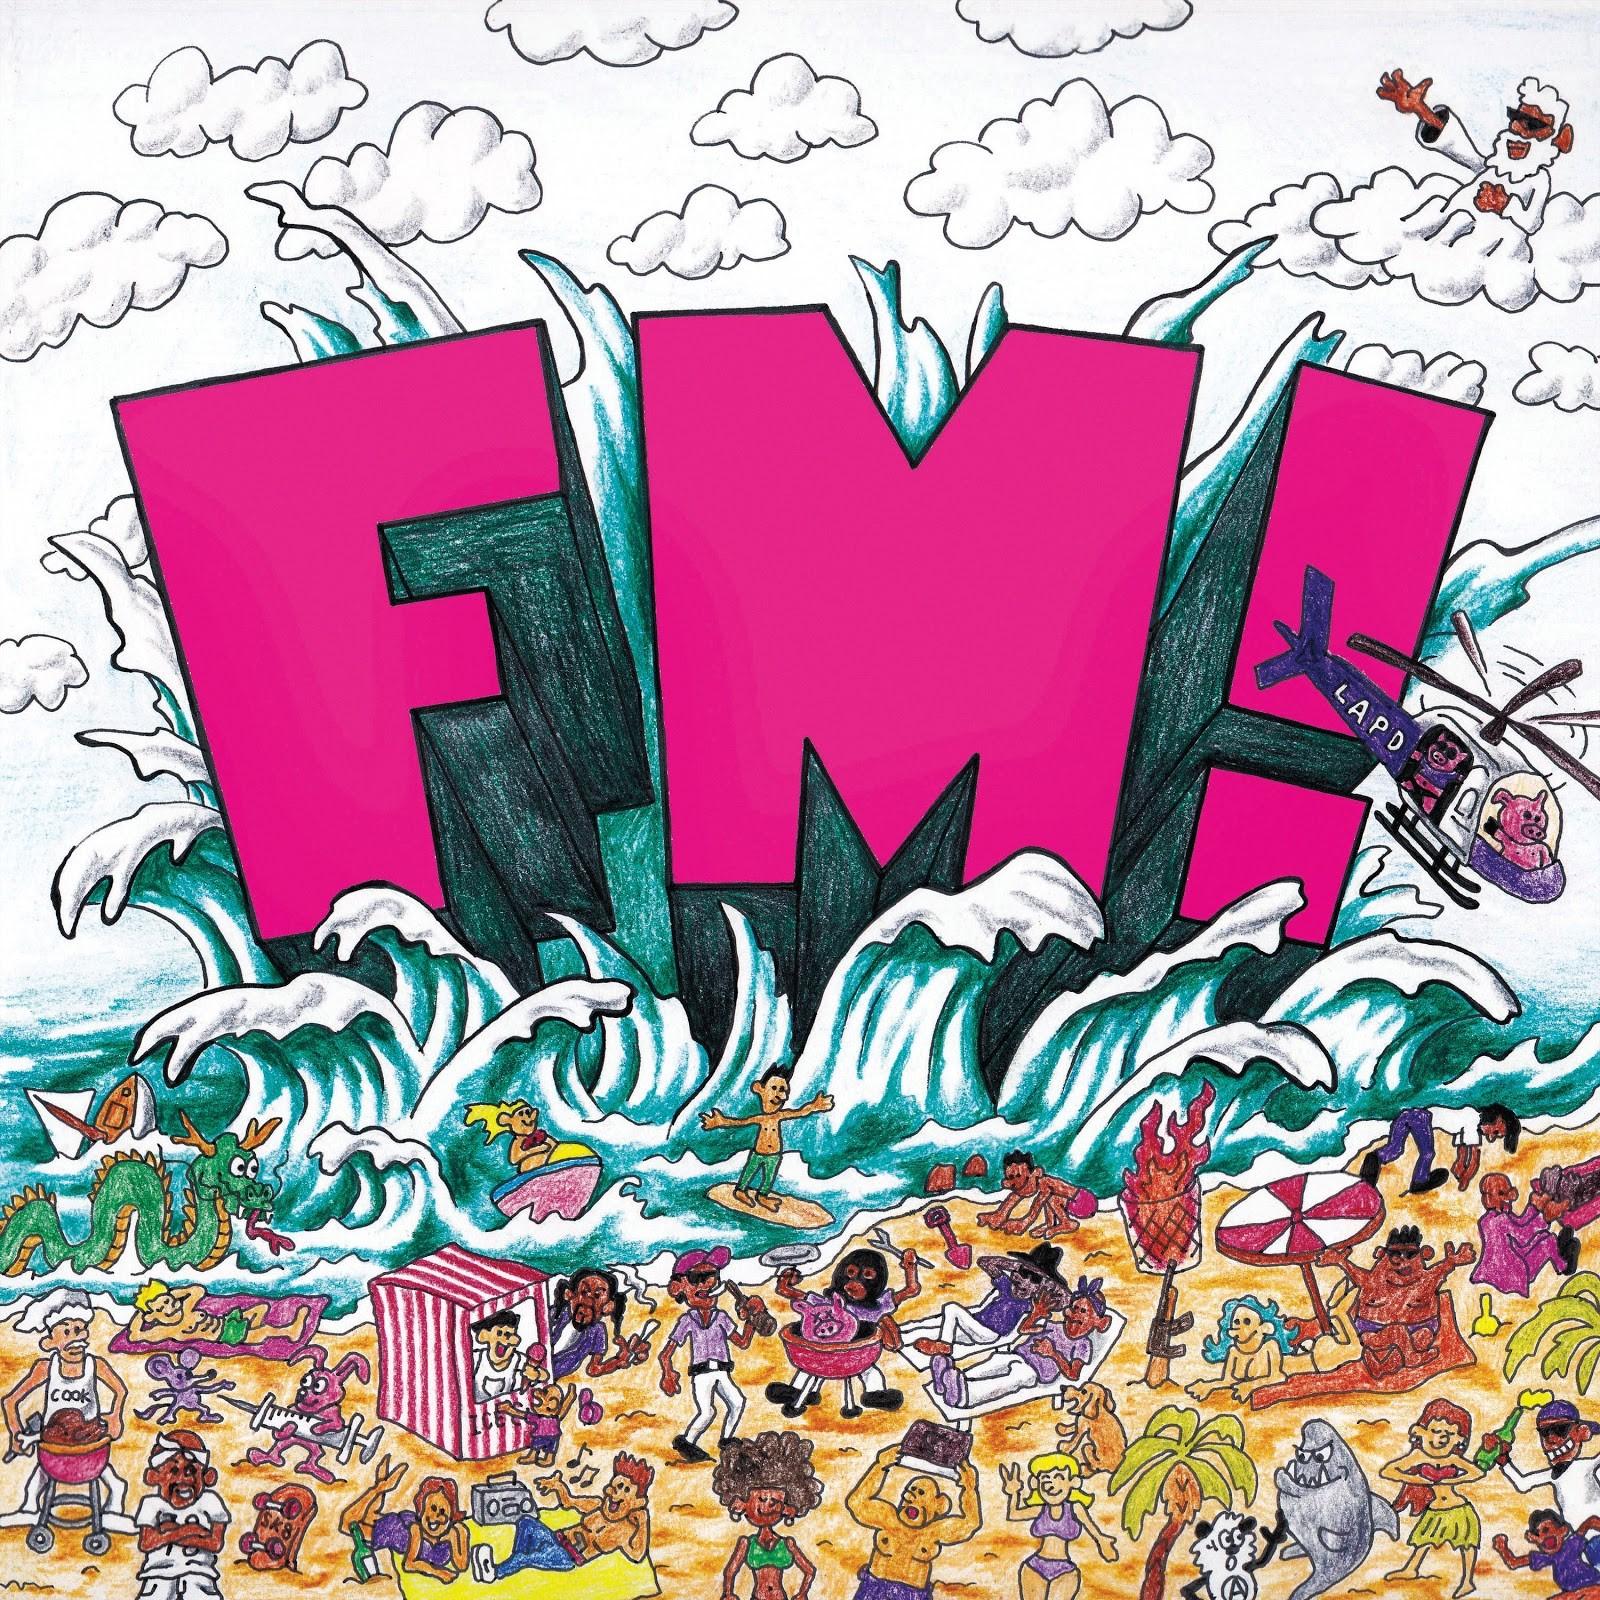 5. - FM!By Vince Staples